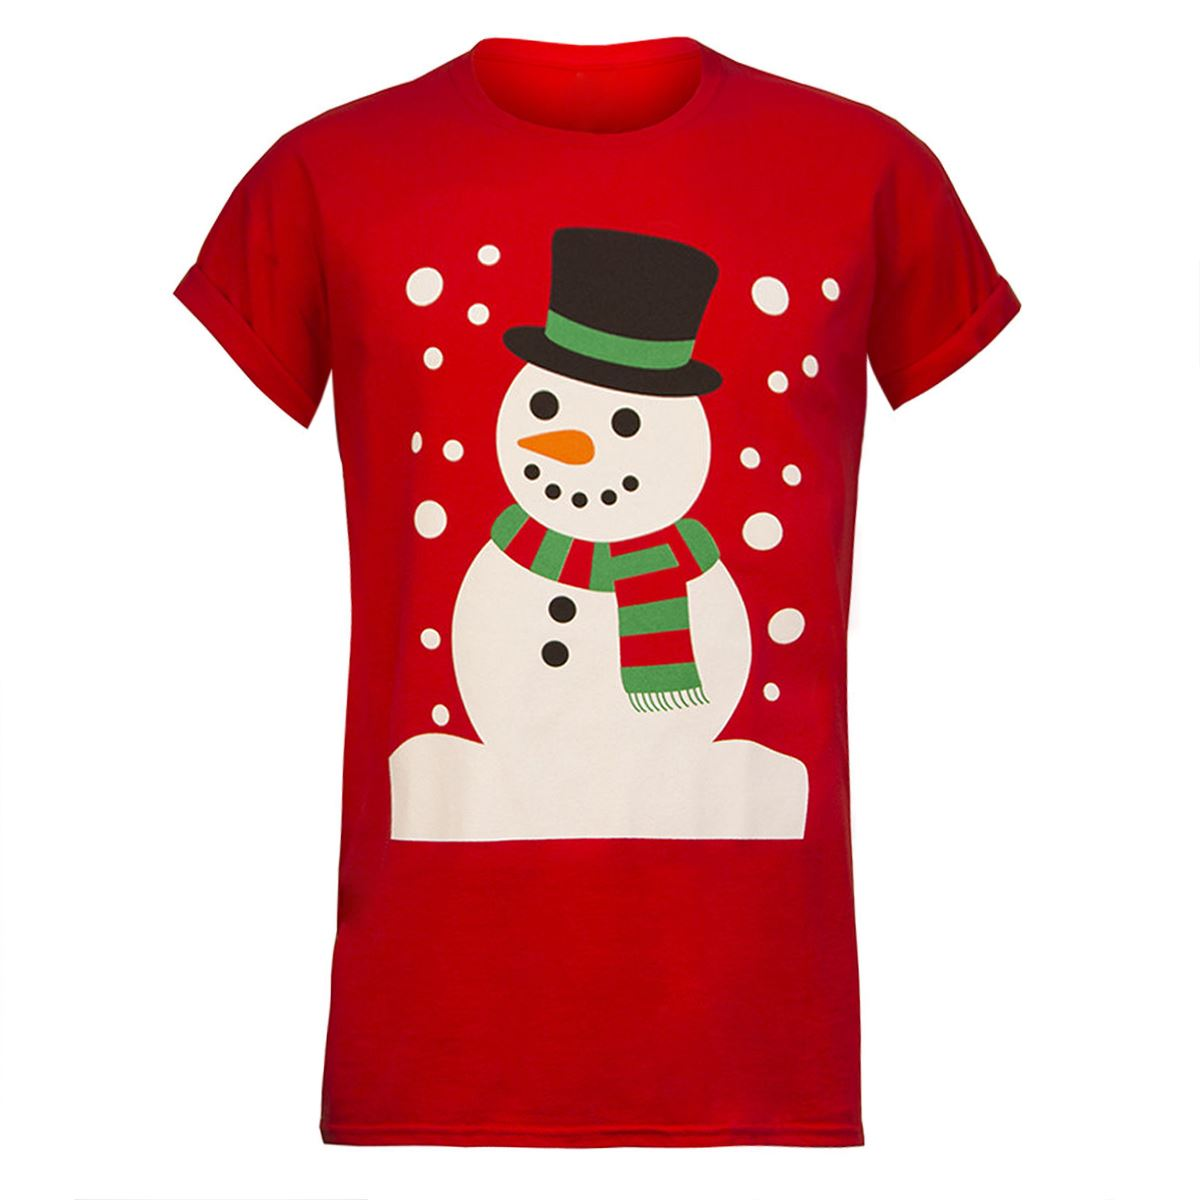 Unisex Christmas Gift Ideas: MENS XMAS T SHIRT NOVELTY CHRISTMAS WOMENS UNISEX SANTA